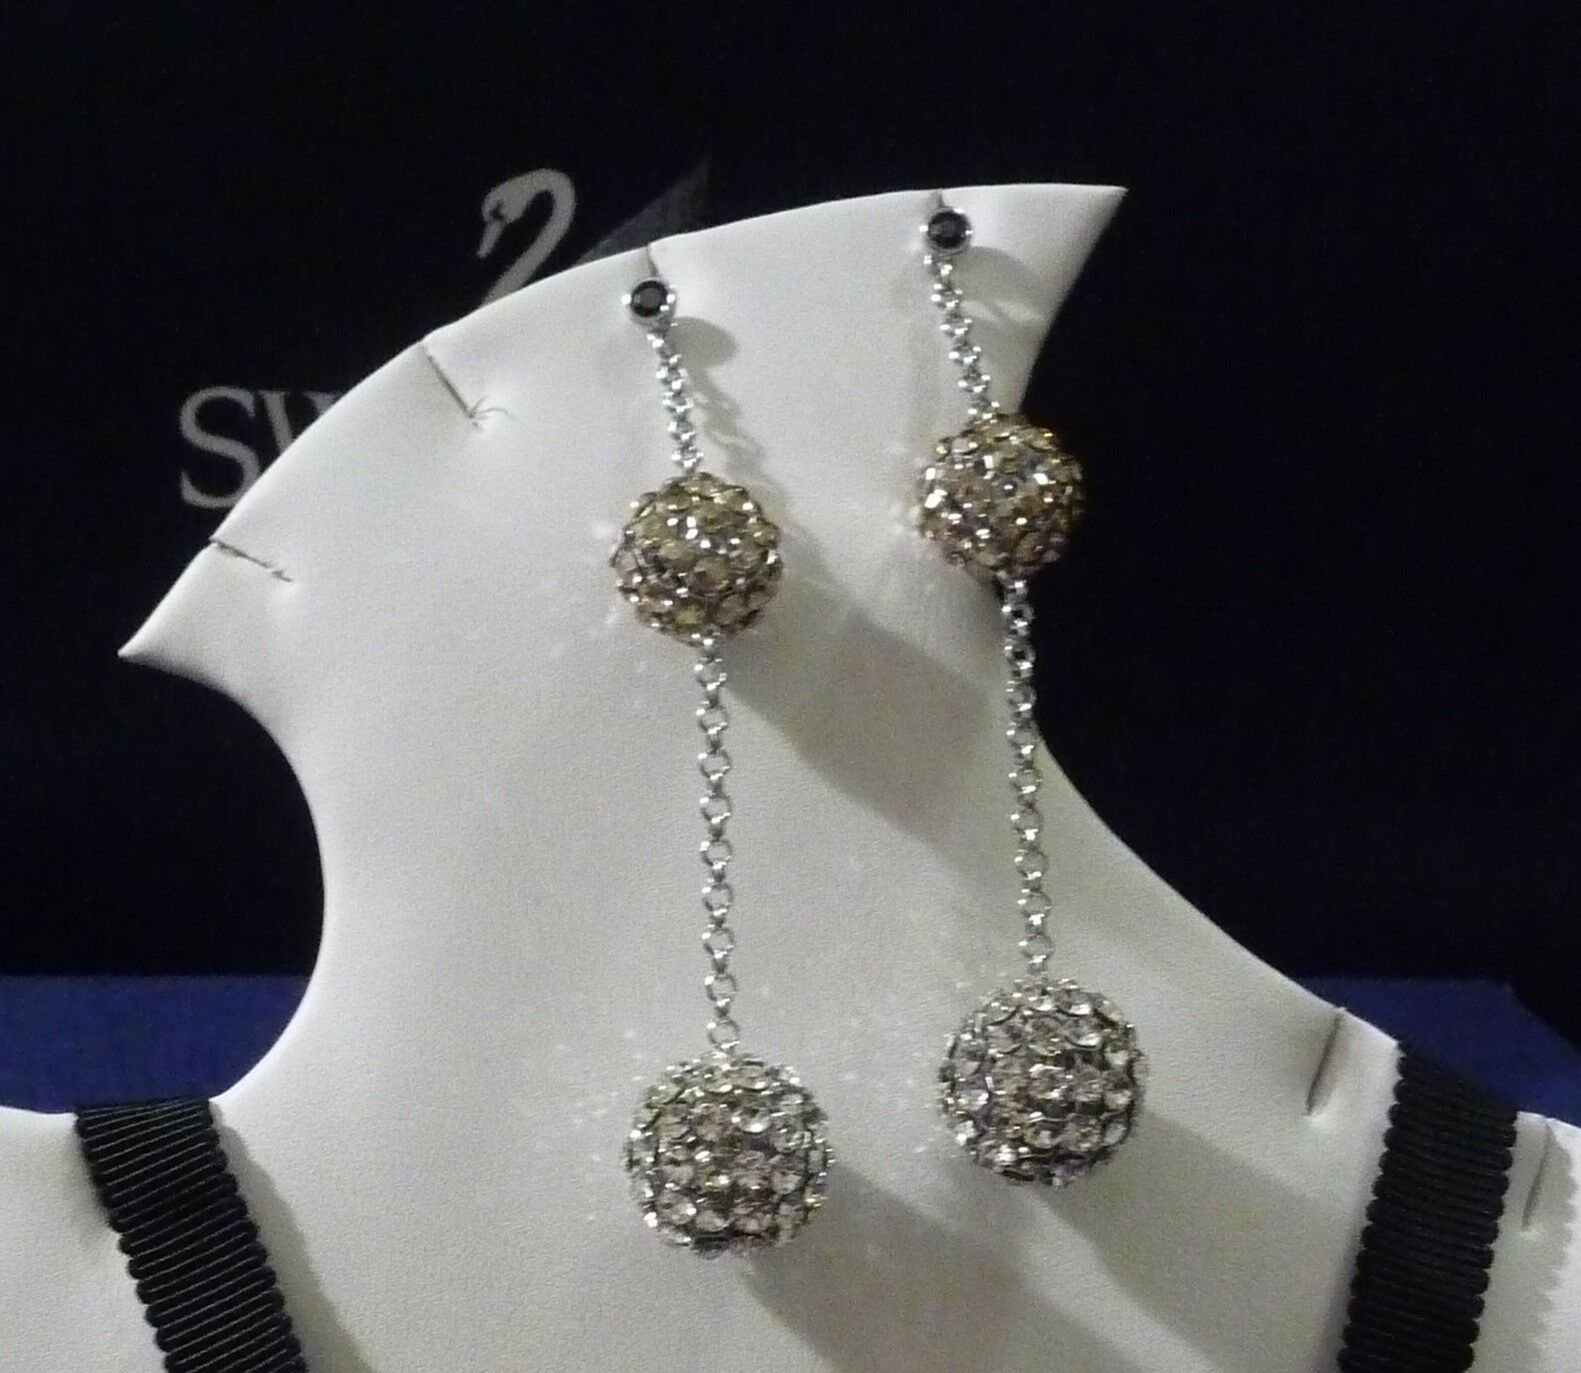 Swarovski Pin Up Pierced Earrings gold Crystal Jewelry - 1110469 - NIB - Retired